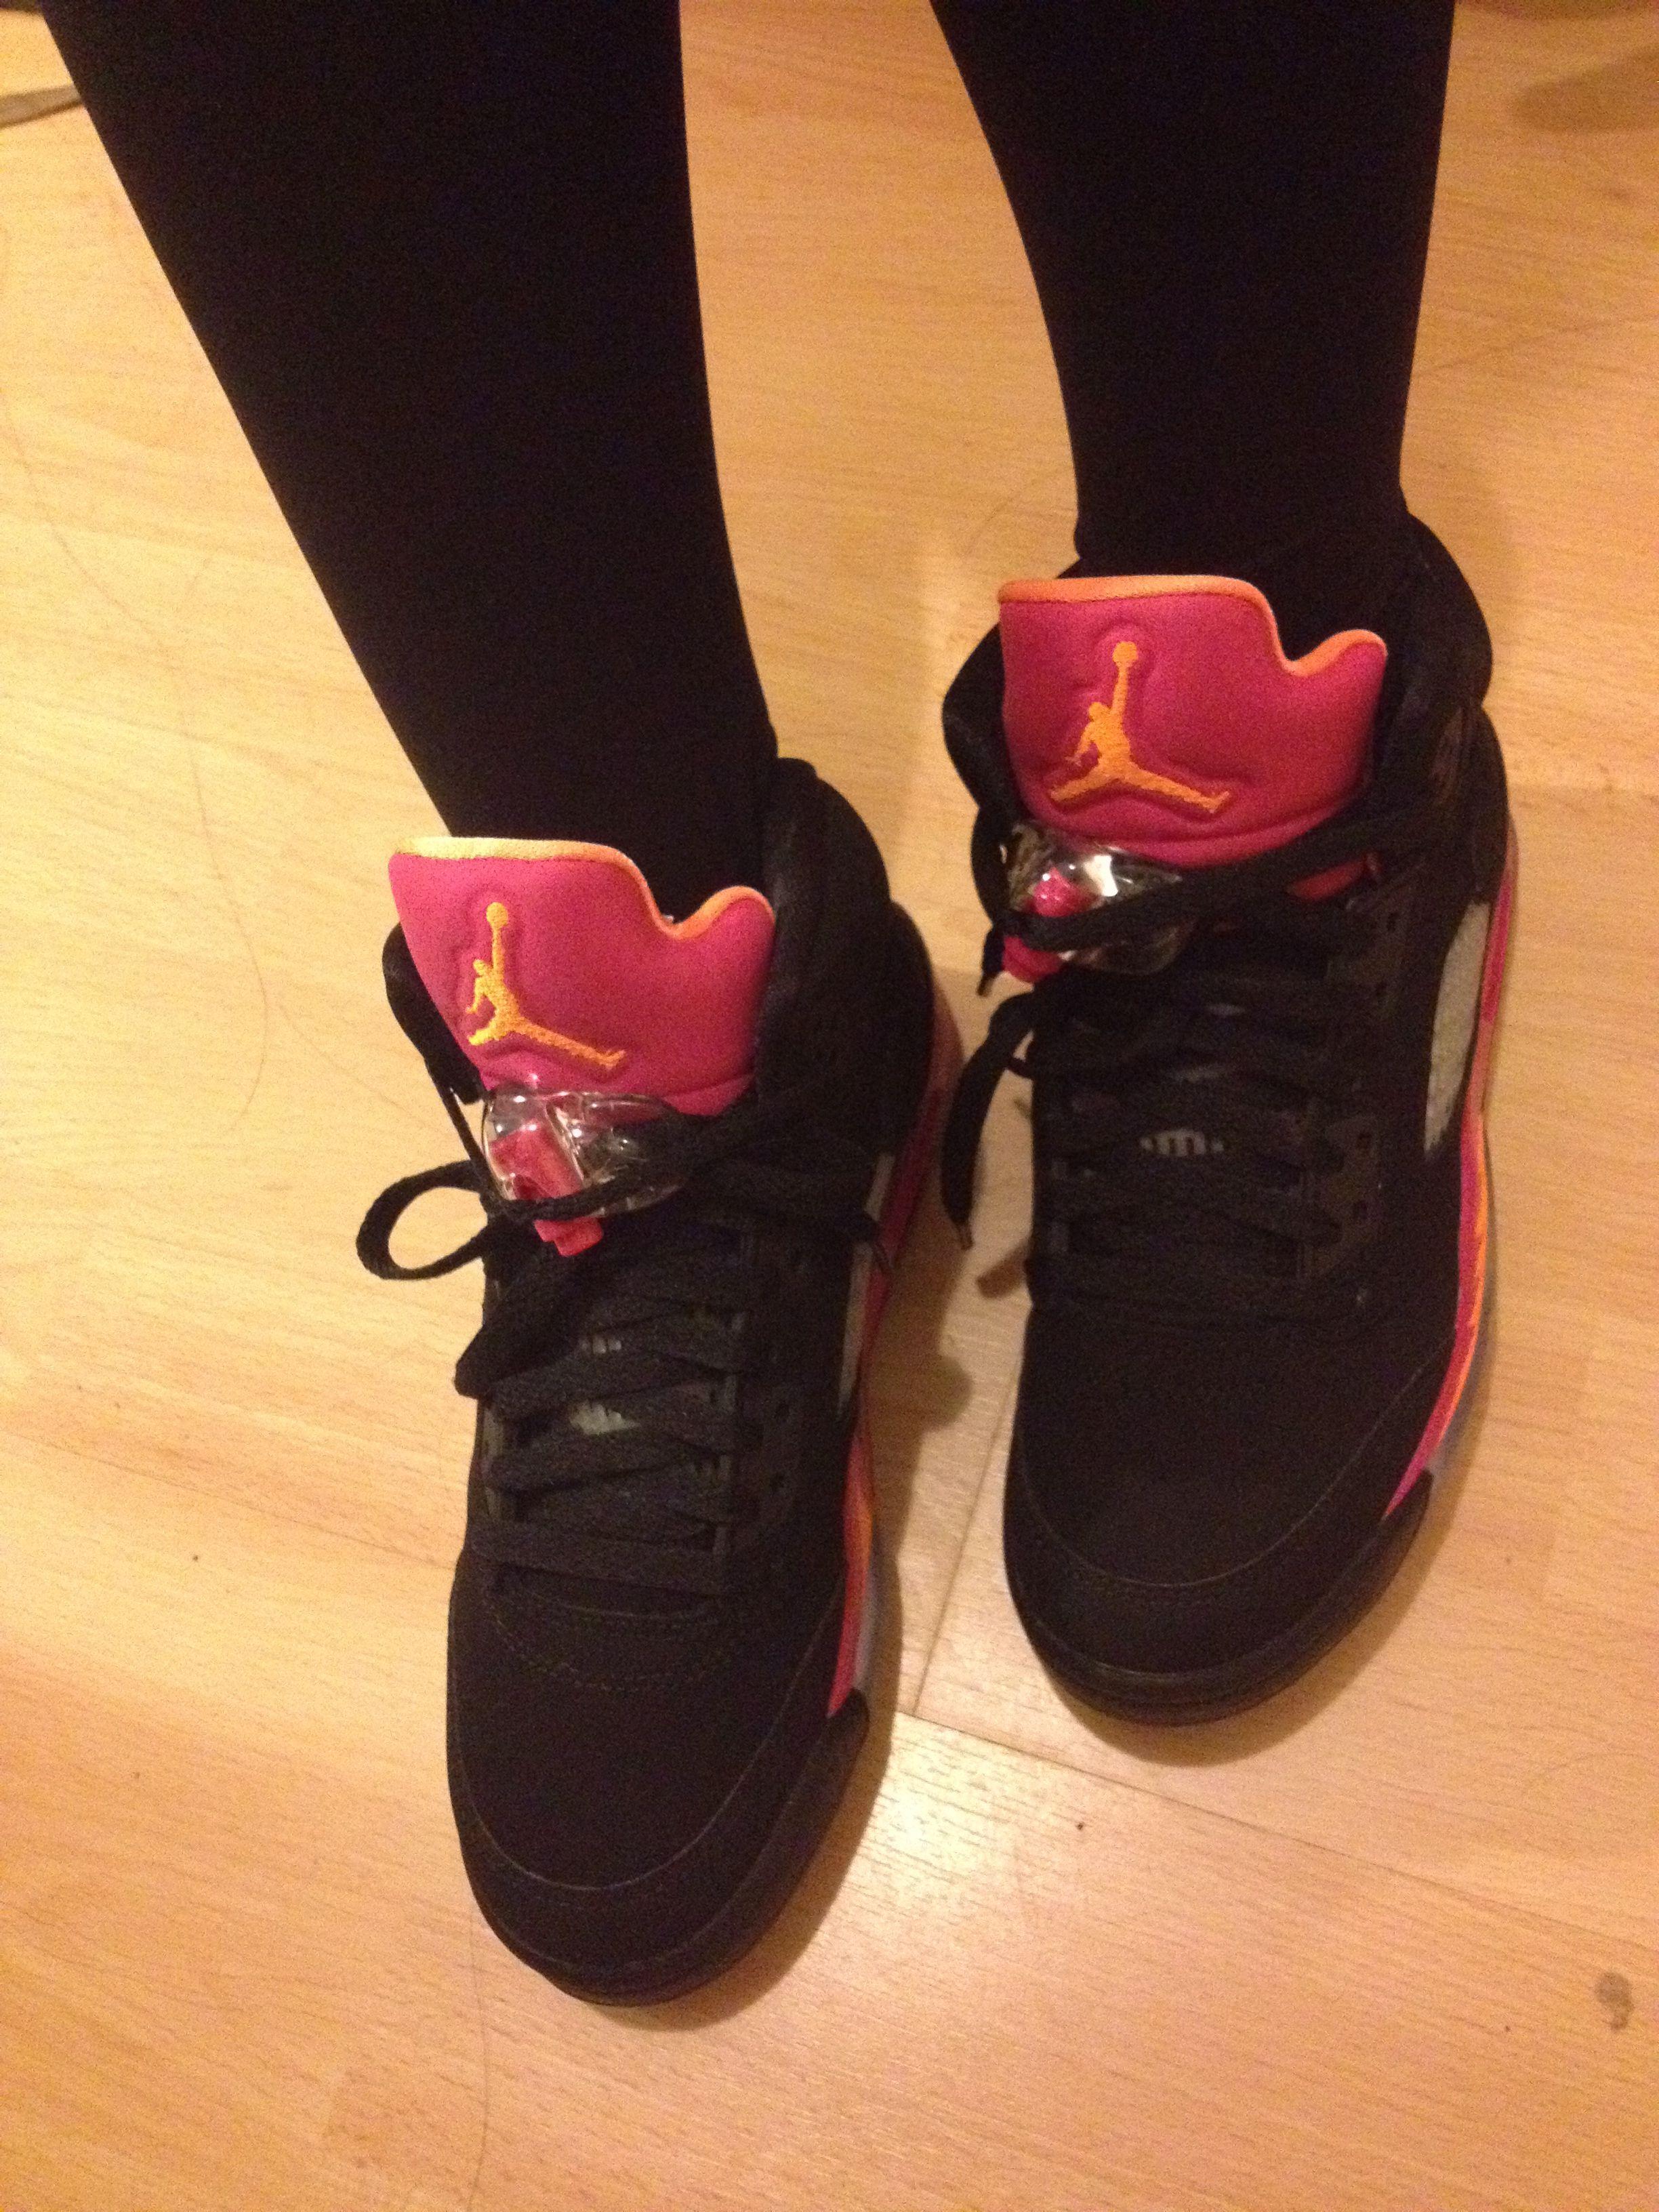 official photos 6436e 50318 Air Jordan women shoes Sapatos Nike Jordan, Sapatos Jordans, Sapatos Jordan  Baratos, Jordans